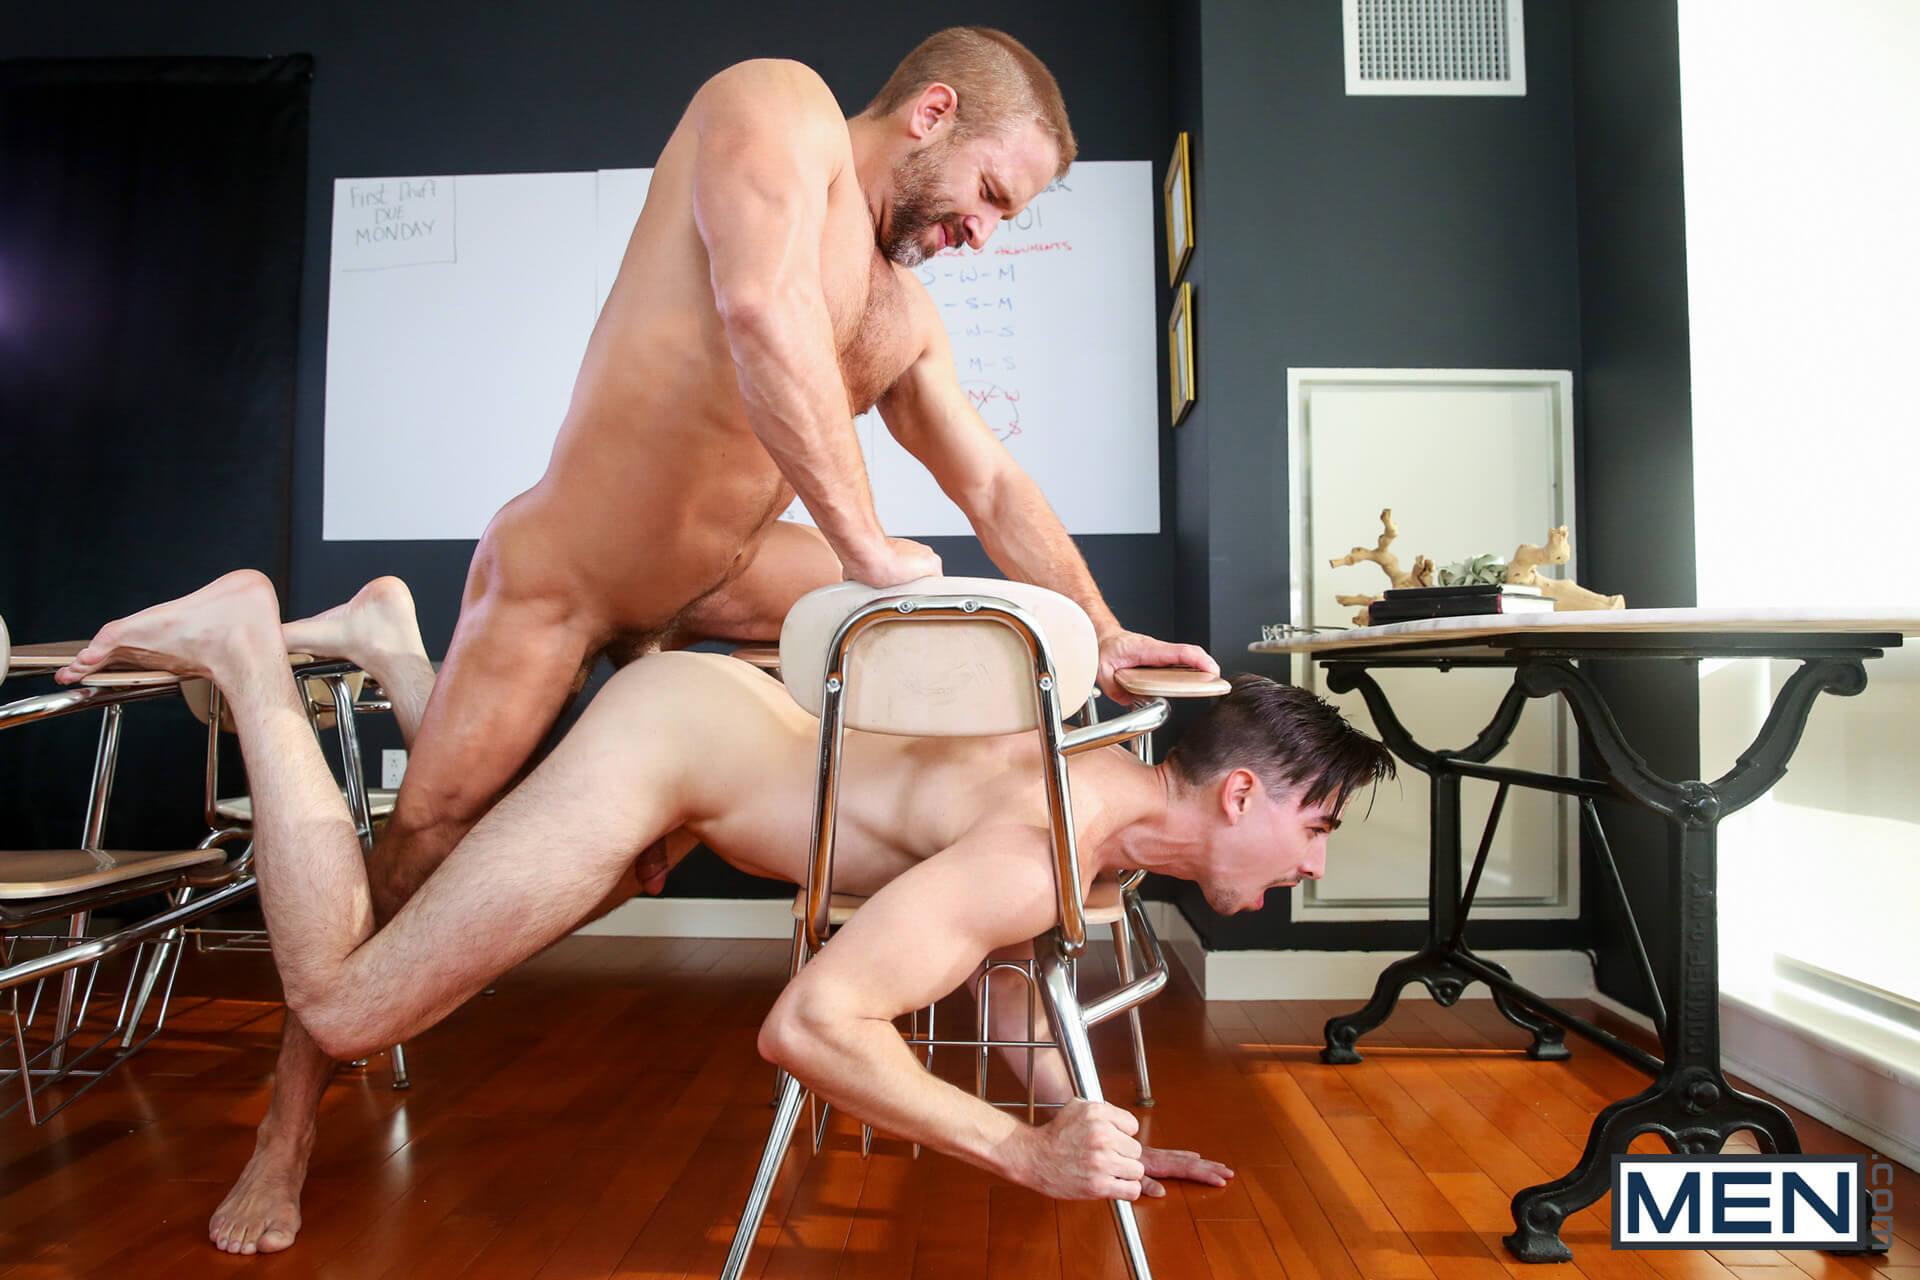 men big dicks at school straight a student part 3 dirk caber jack hunter gay porn blog image 21